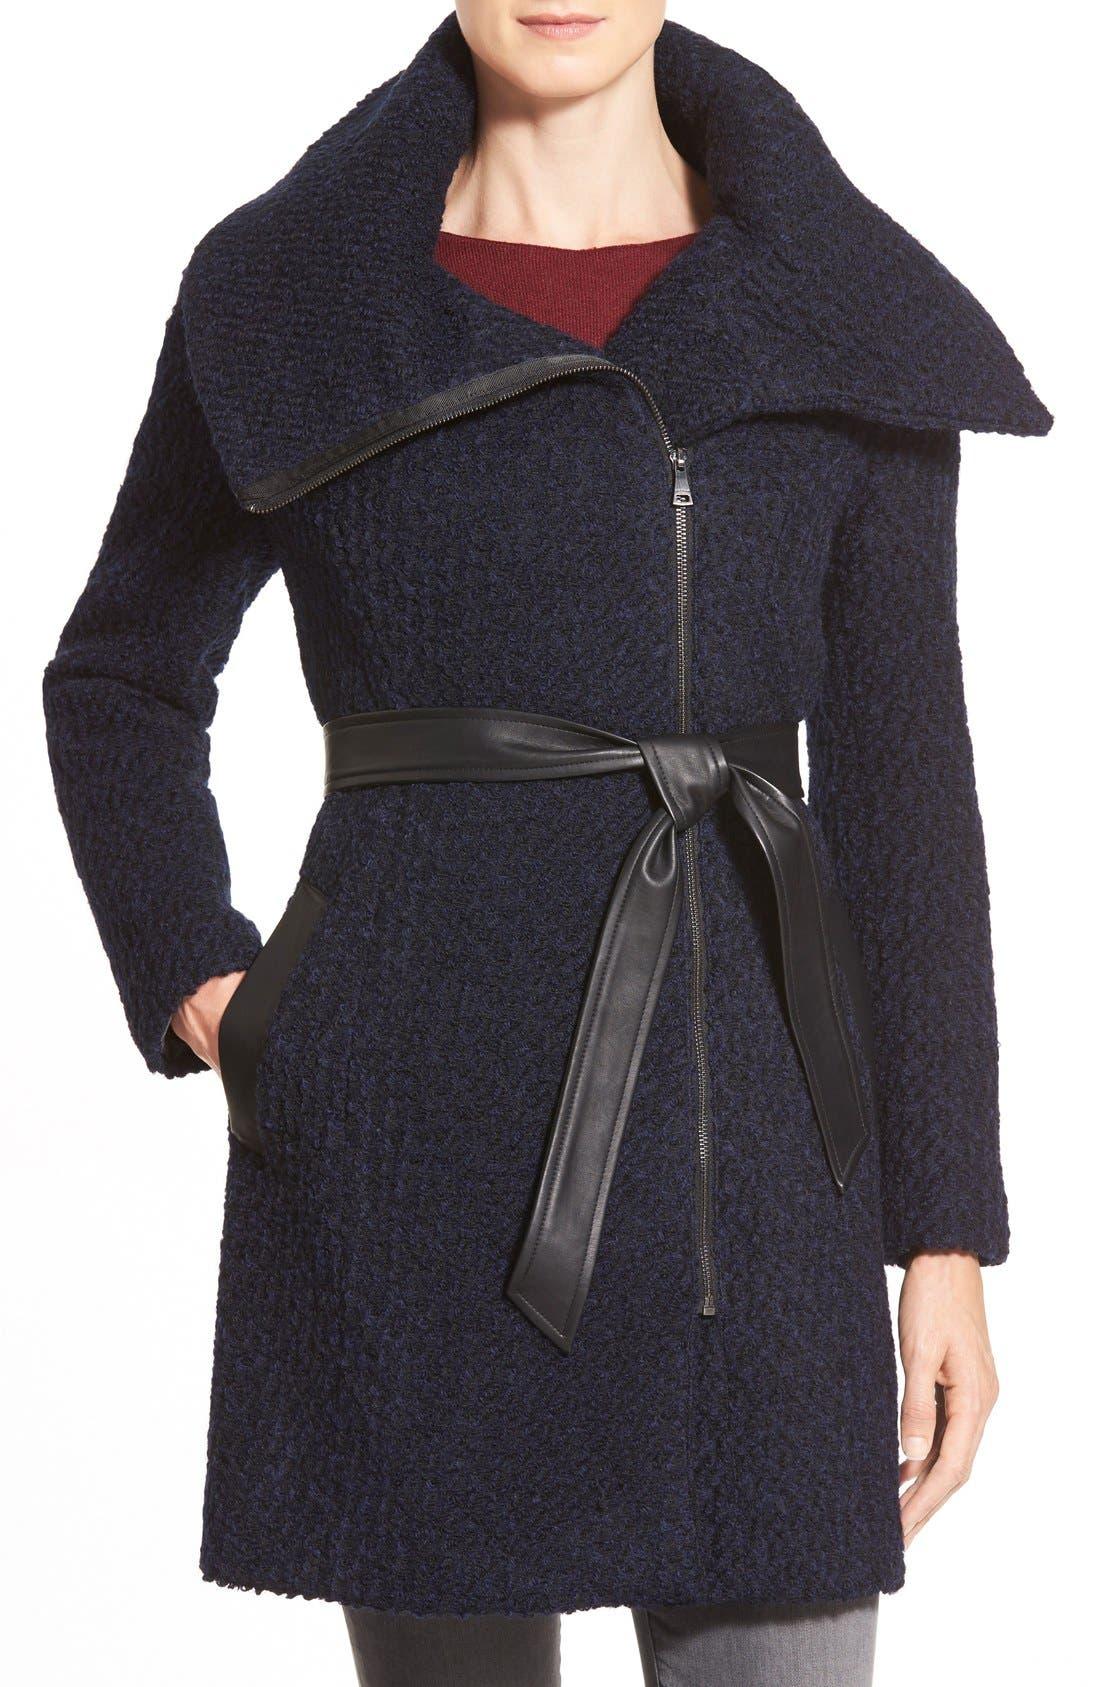 Belted Asymmetrical Bouclé Wool Blend Coat,                             Main thumbnail 1, color,                             004